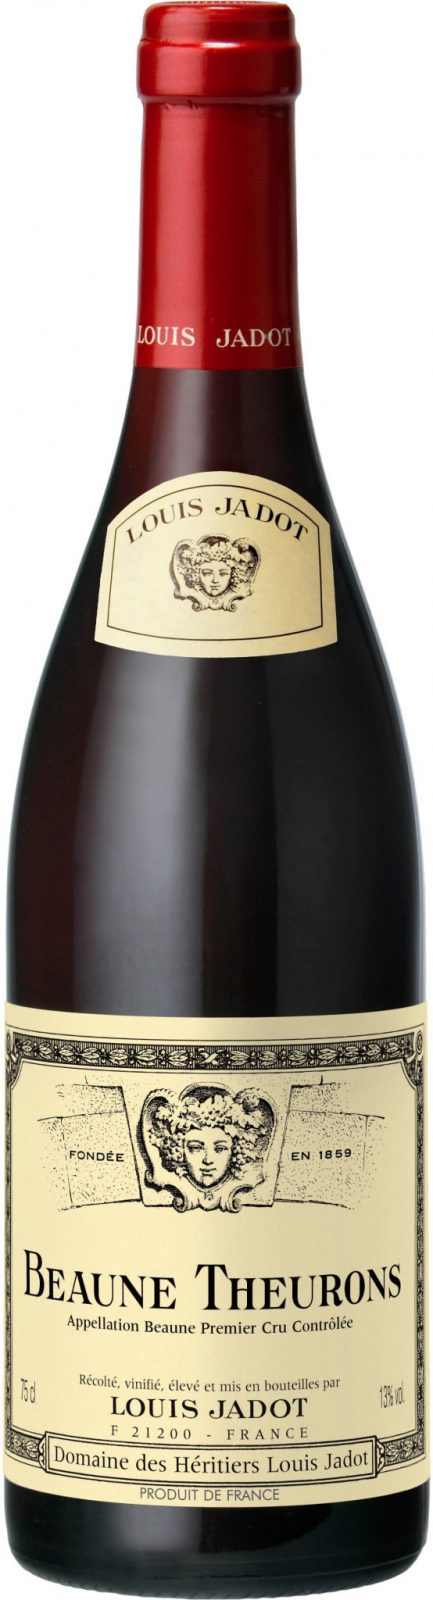 Louis Jadot Beaune Theurons WineAffair